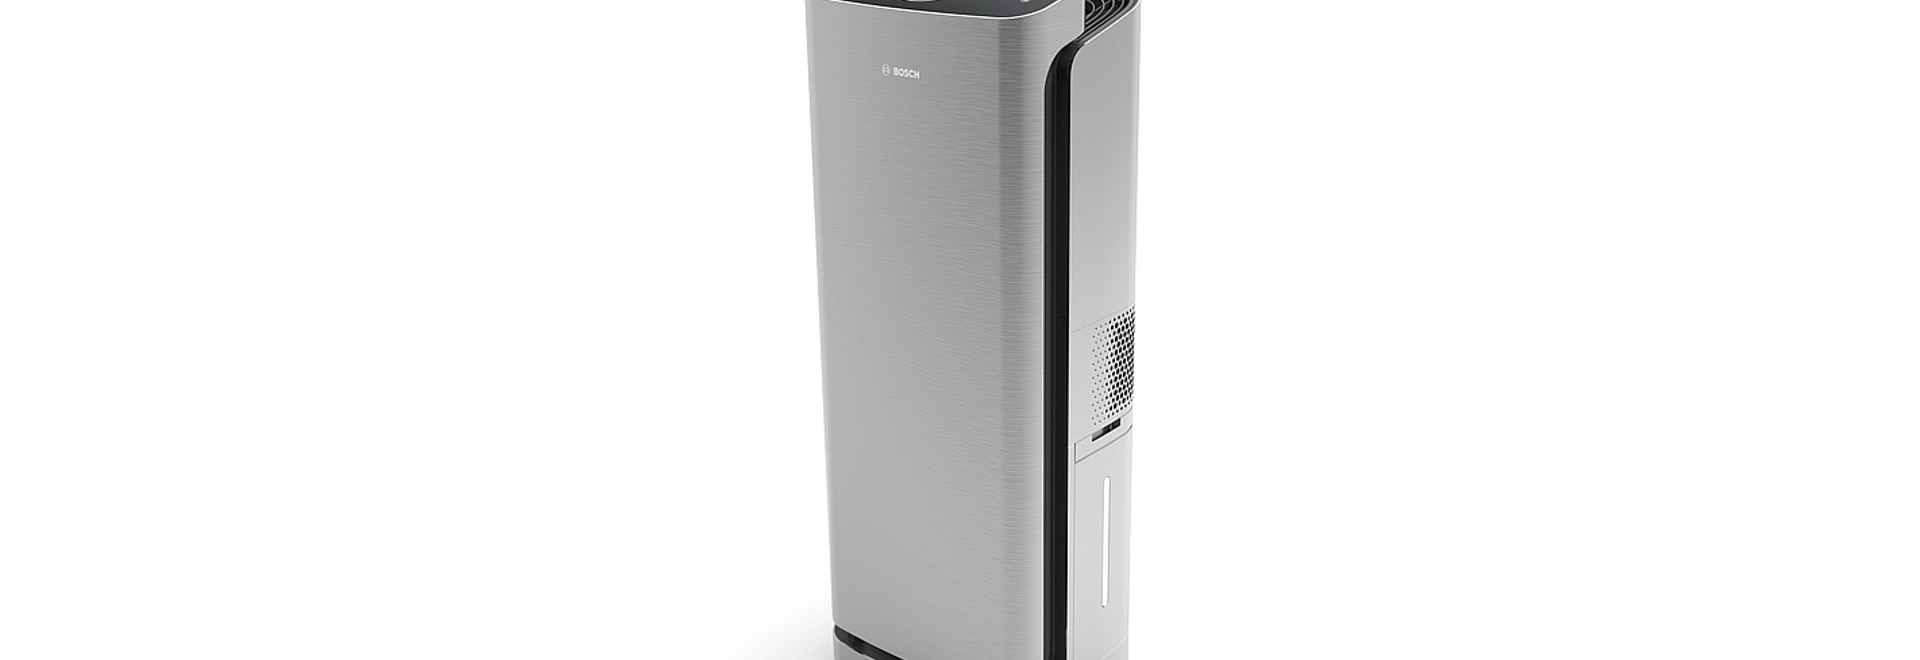 Air de Bosch 7000 séries